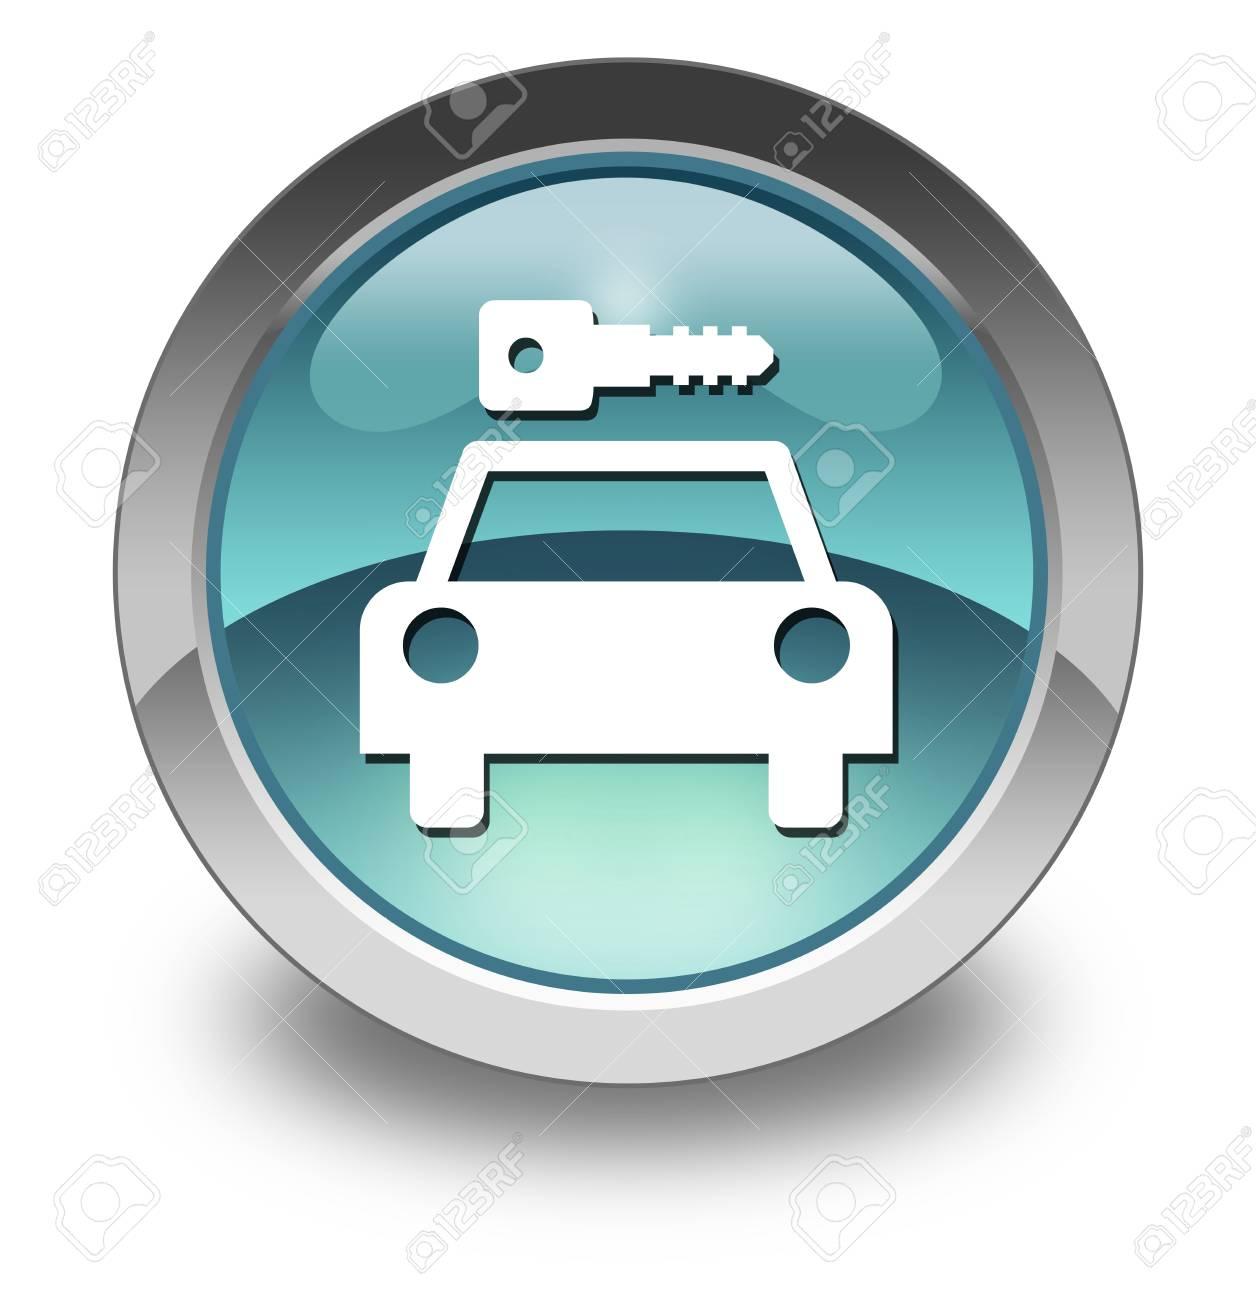 Icon, Button, Pictogram with Car Rental symbol Stock Photo - 27196415